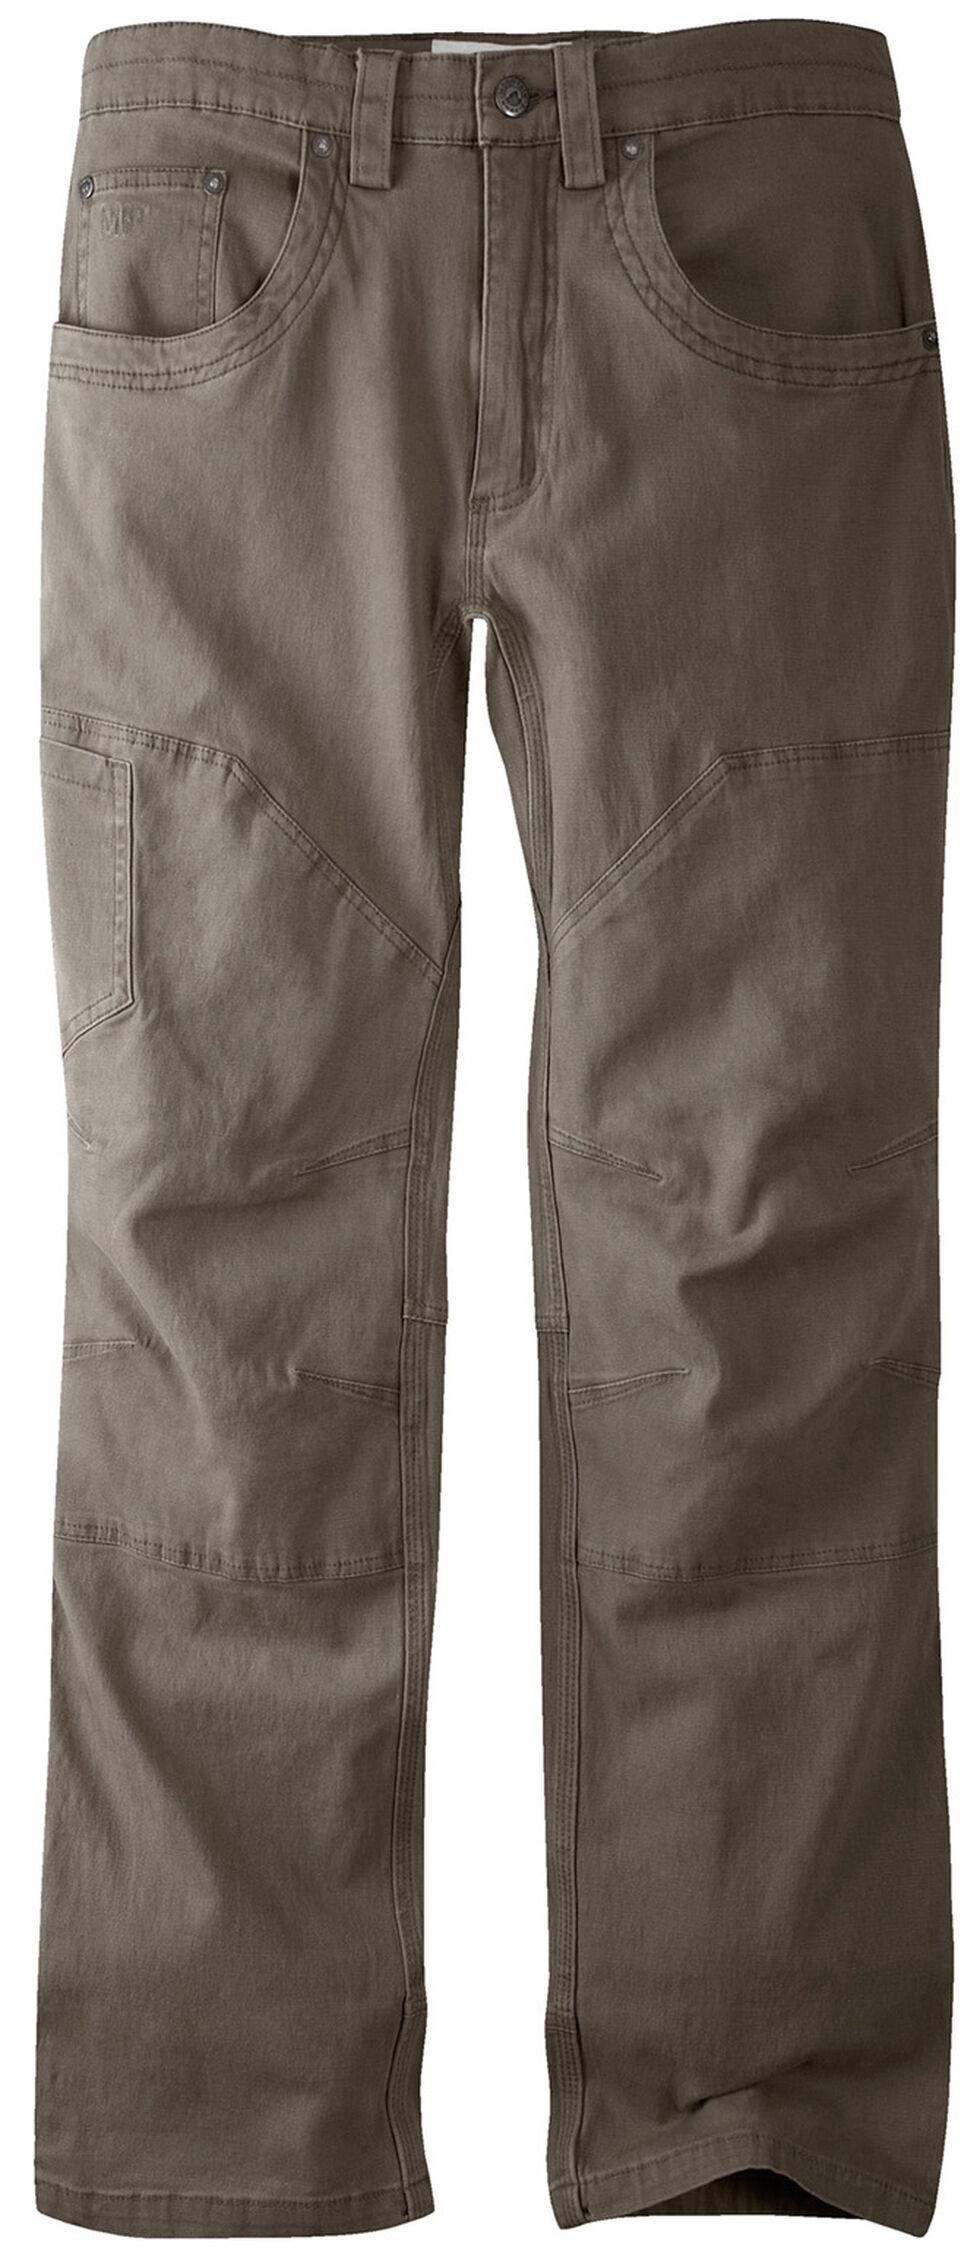 Mountain Khakis Men's Classic Fit Camber 107 Pants , Light Brown, hi-res